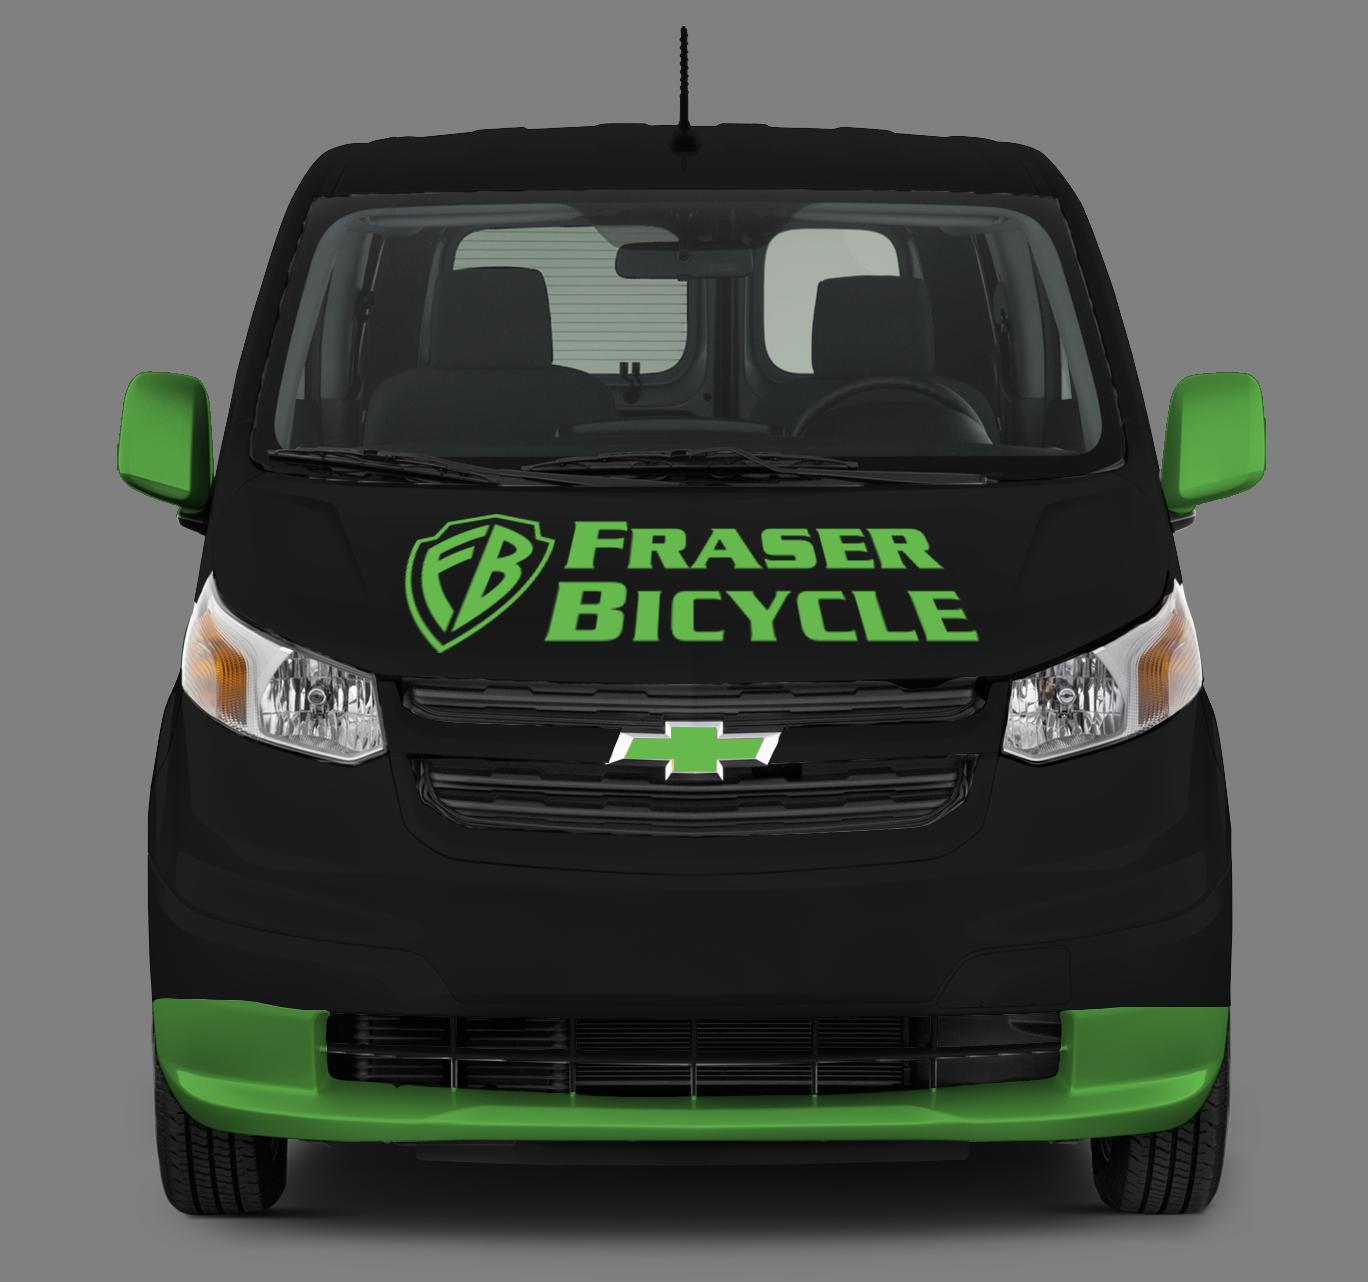 Fraser-Bicycle-Van-Front.png